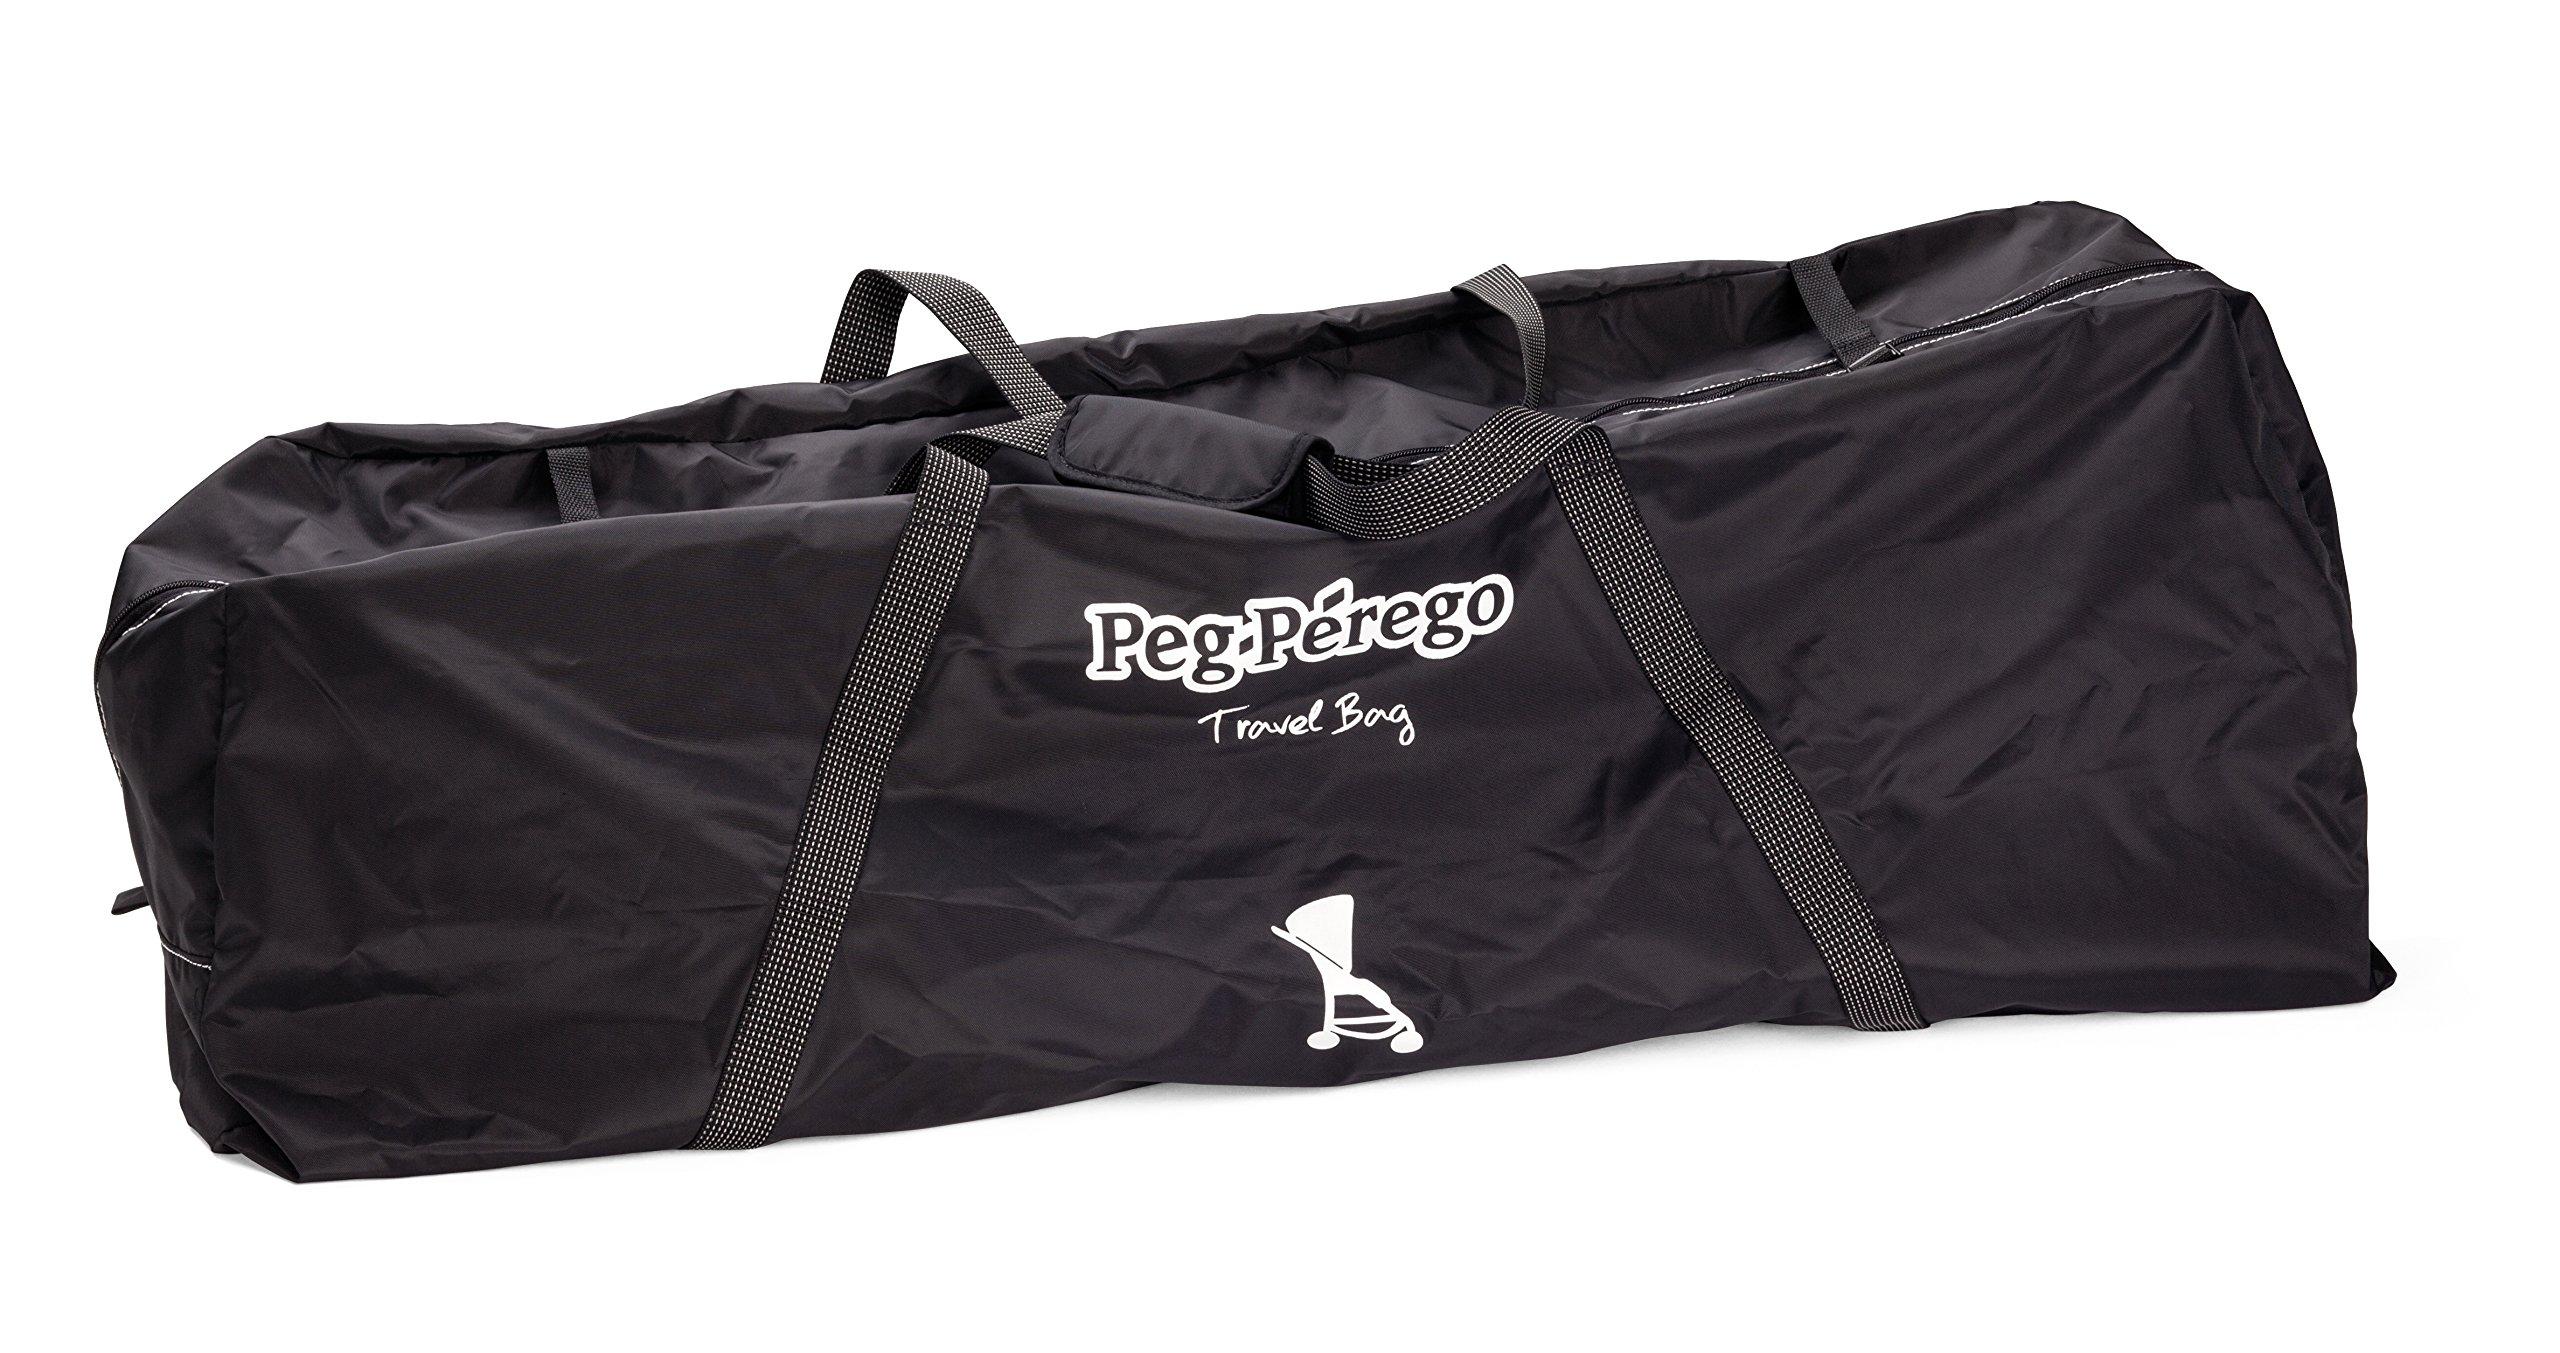 Peg Perego Stroller Travel Bag by Peg Perego